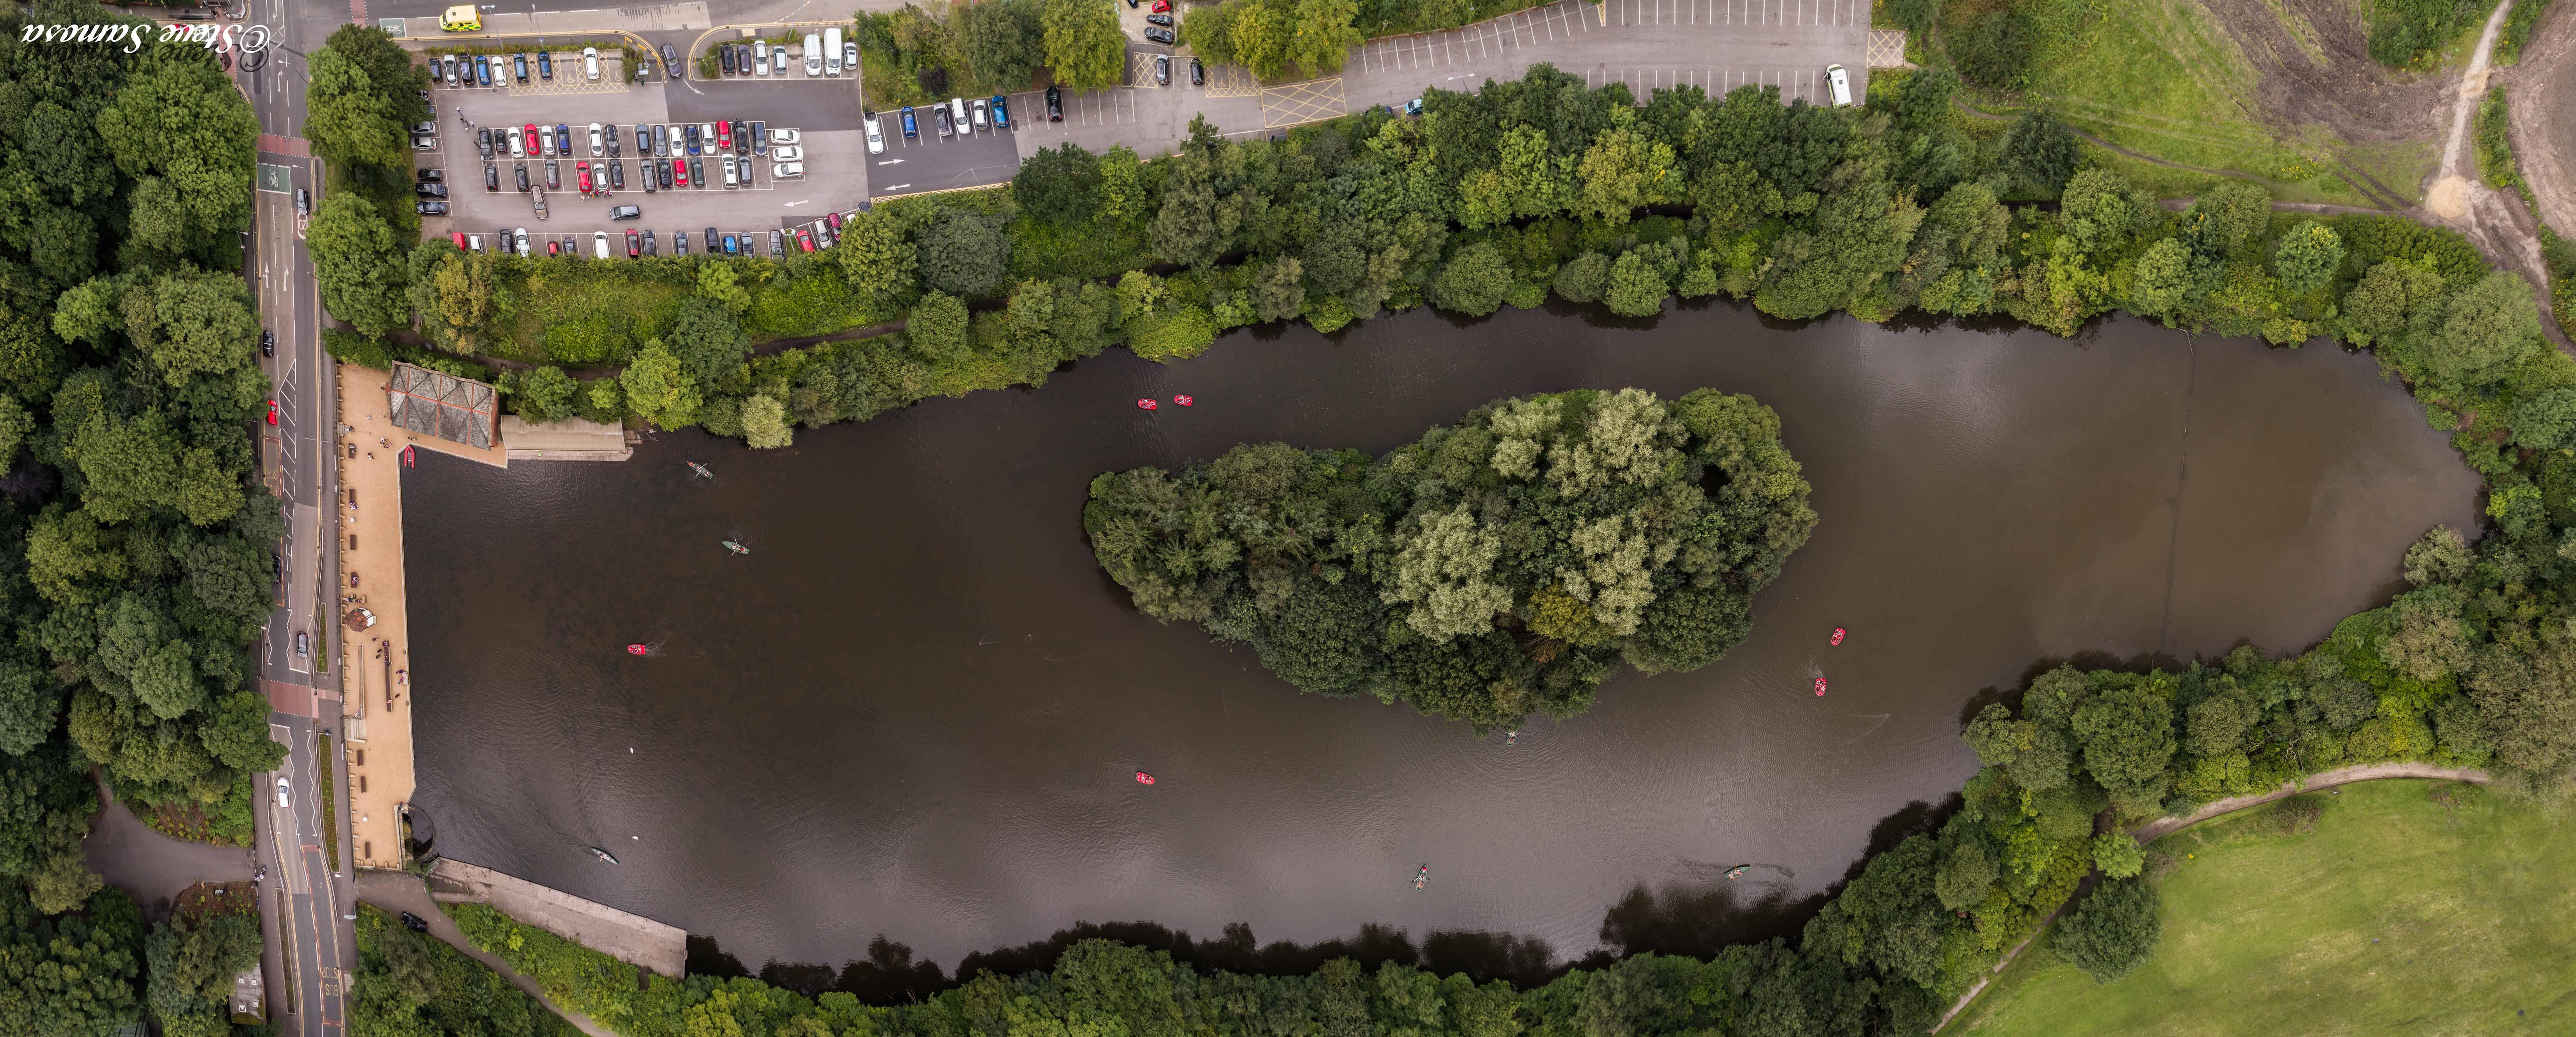 Stamford Park Boating Lake